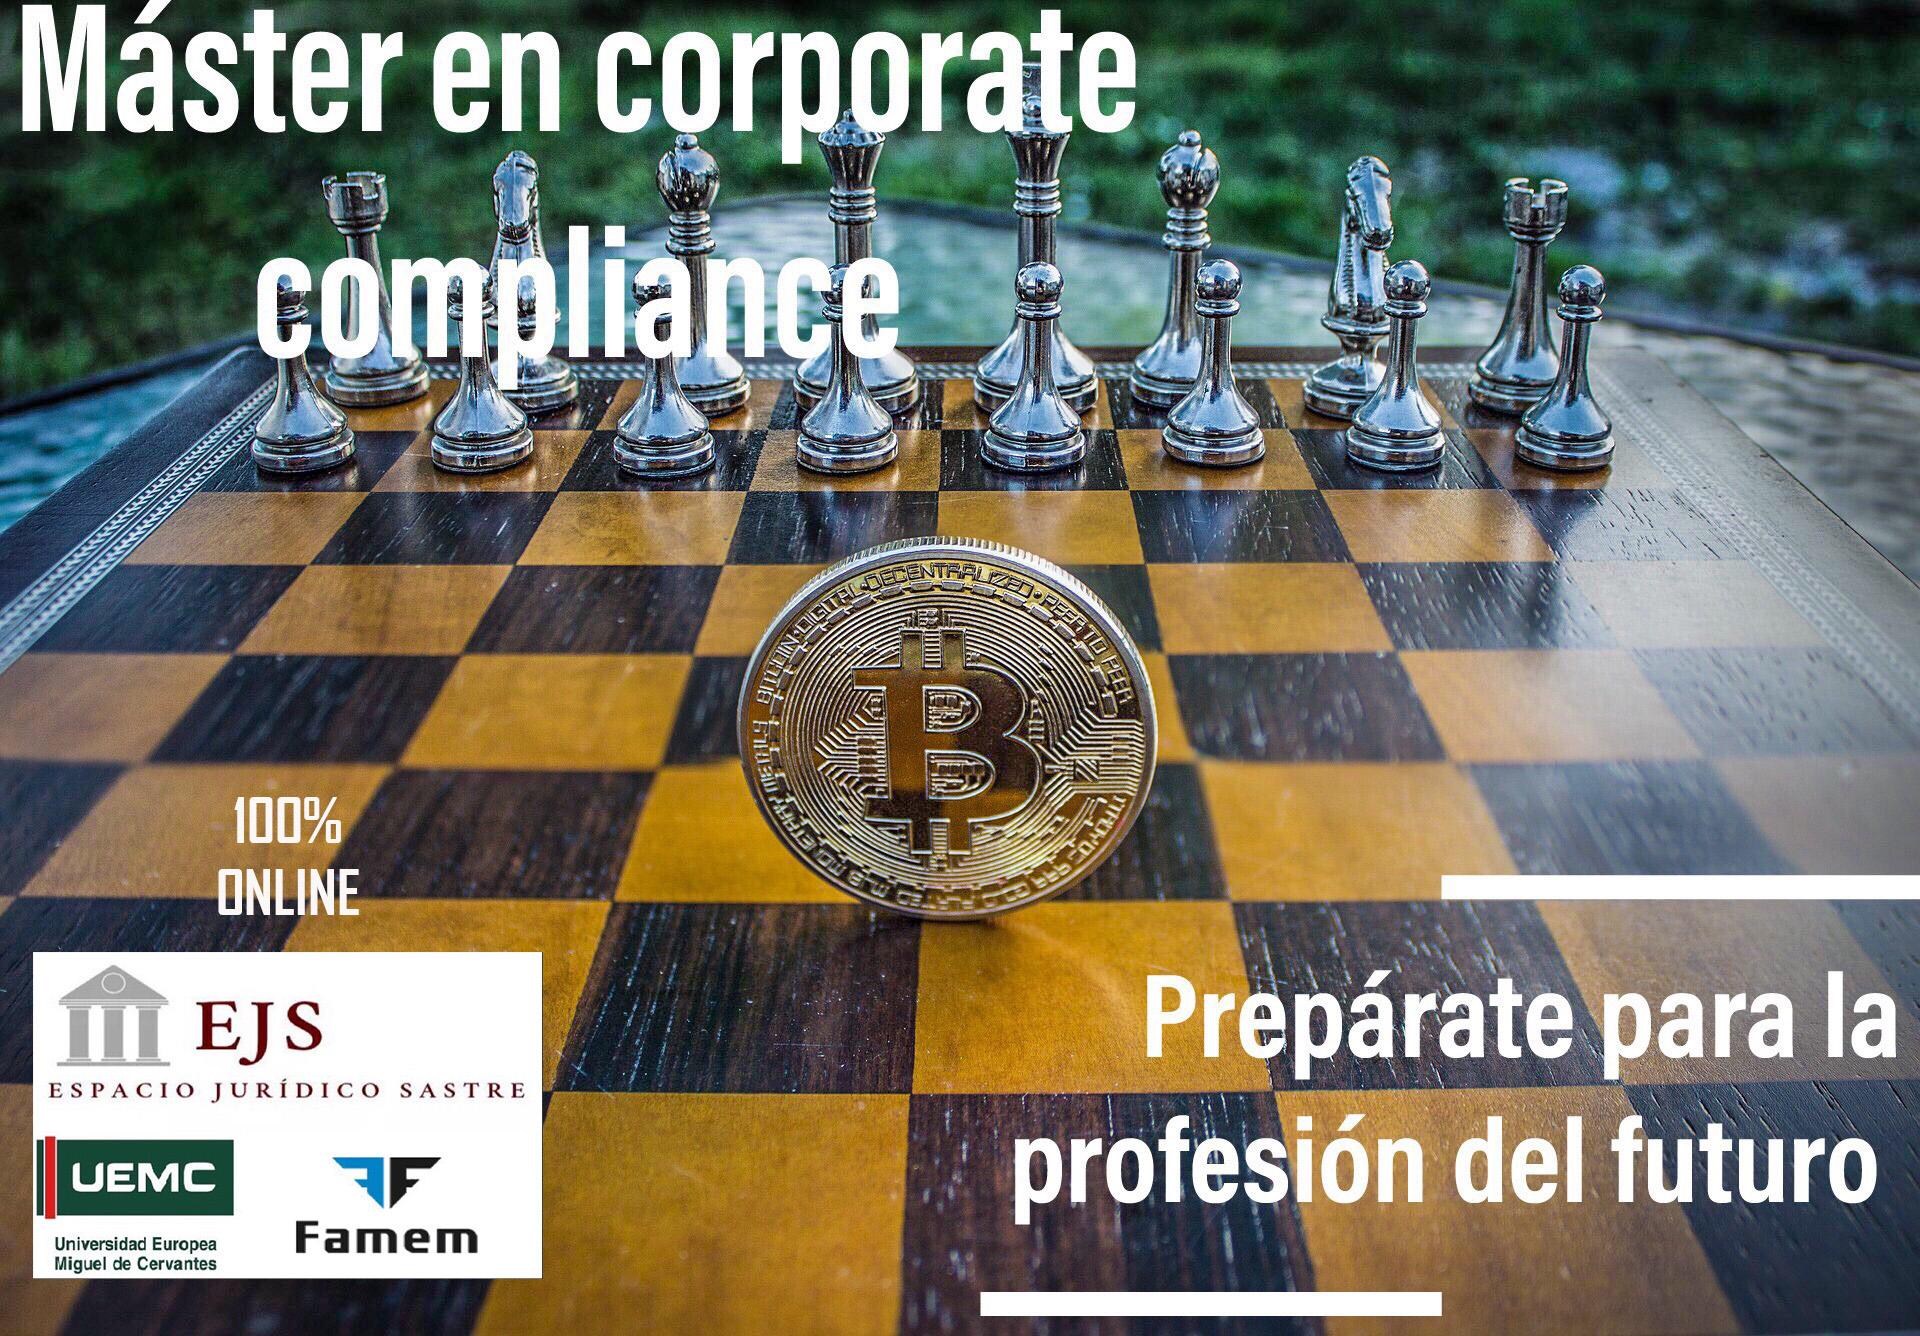 Master corporate compliance